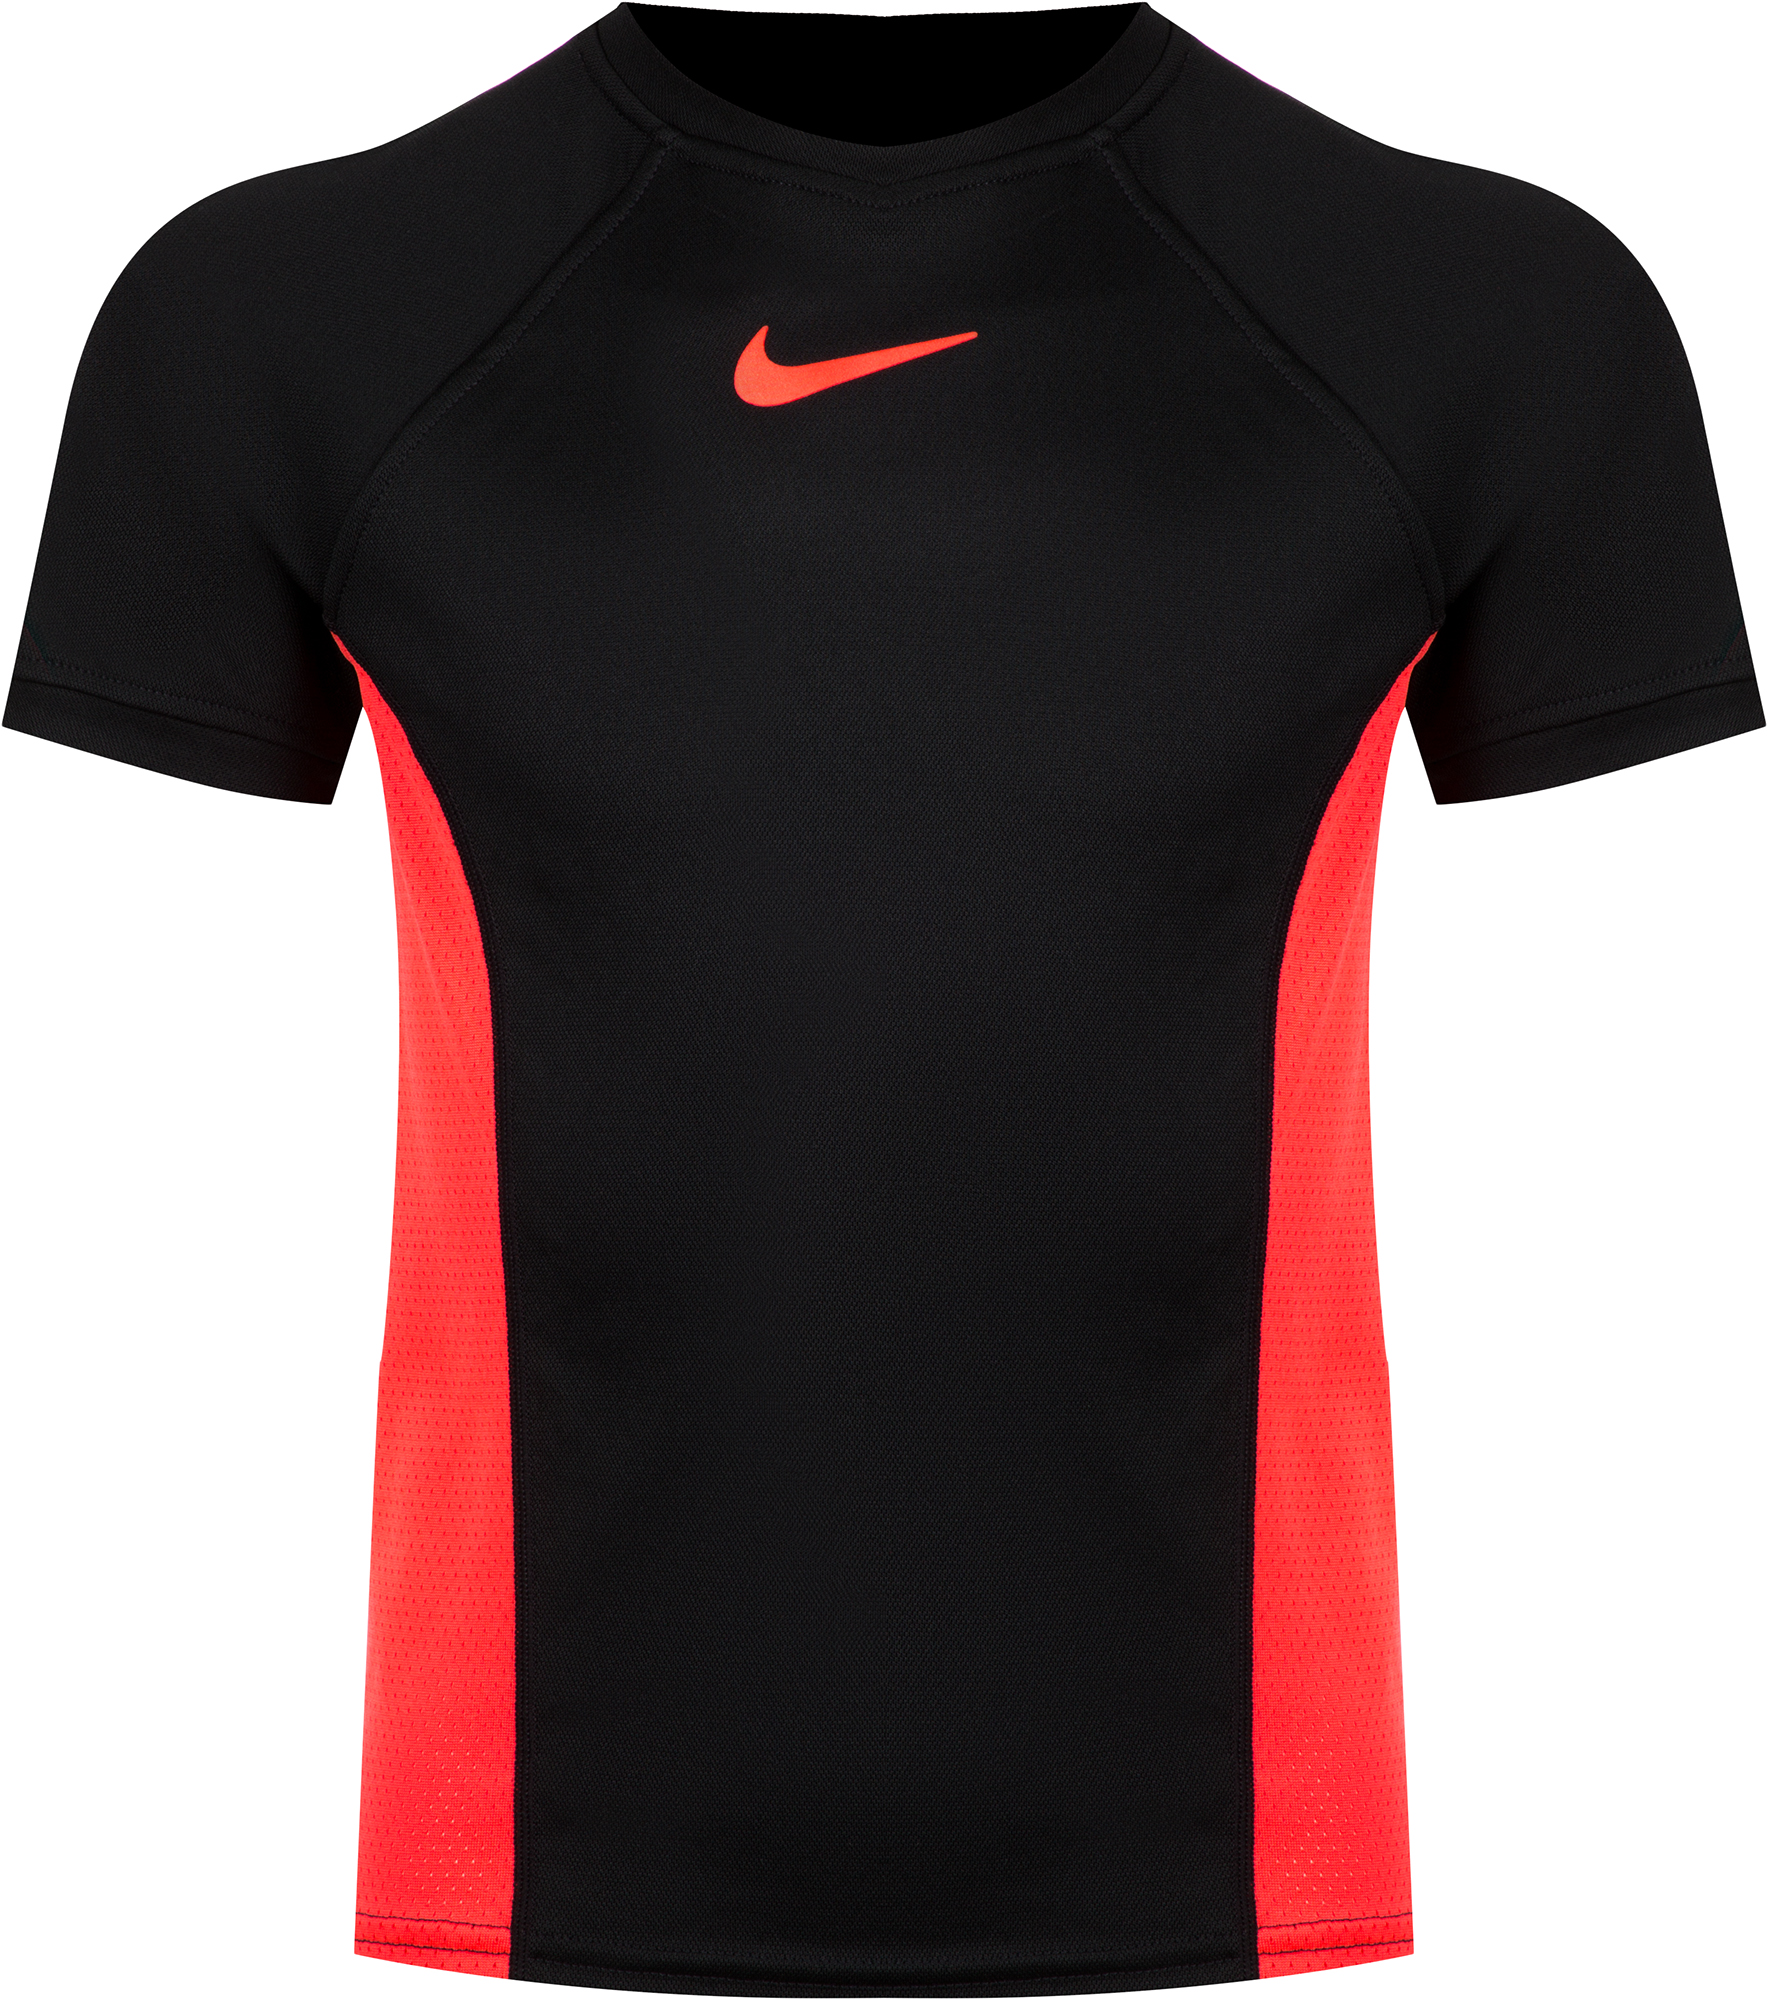 Фото - Nike Футболка для мальчиков Nike Court Dri-FIT, размер 128-137 nike футболка для мальчиков nike dri fit размер 128 137